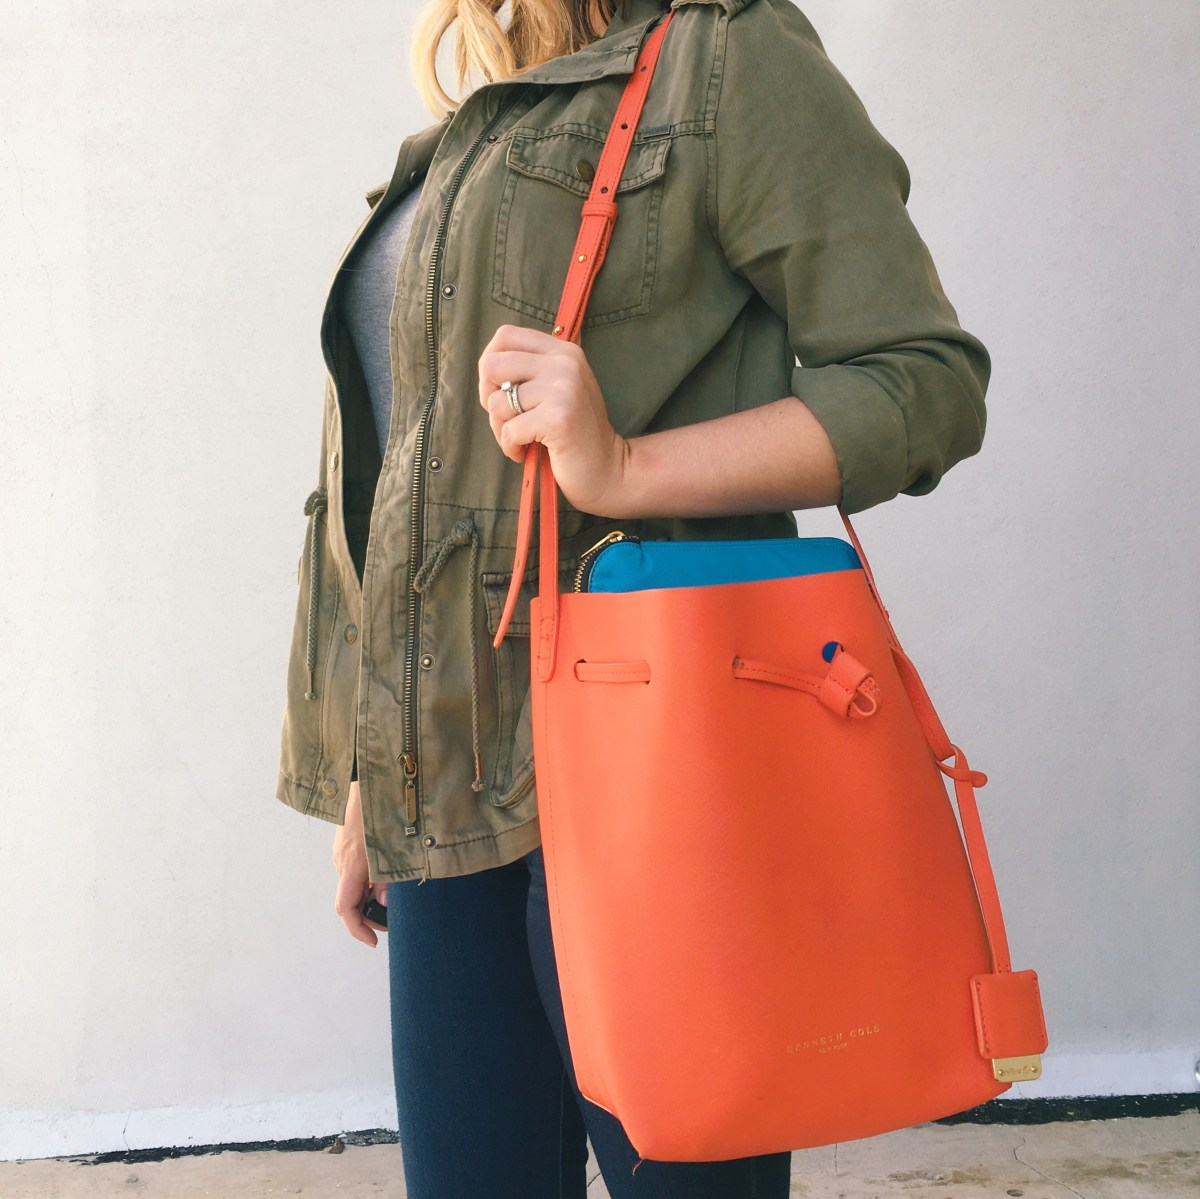 Casual OOTD | TJMaxx utility jacket and Kenneth Cole bucket bag| keiralennox.com